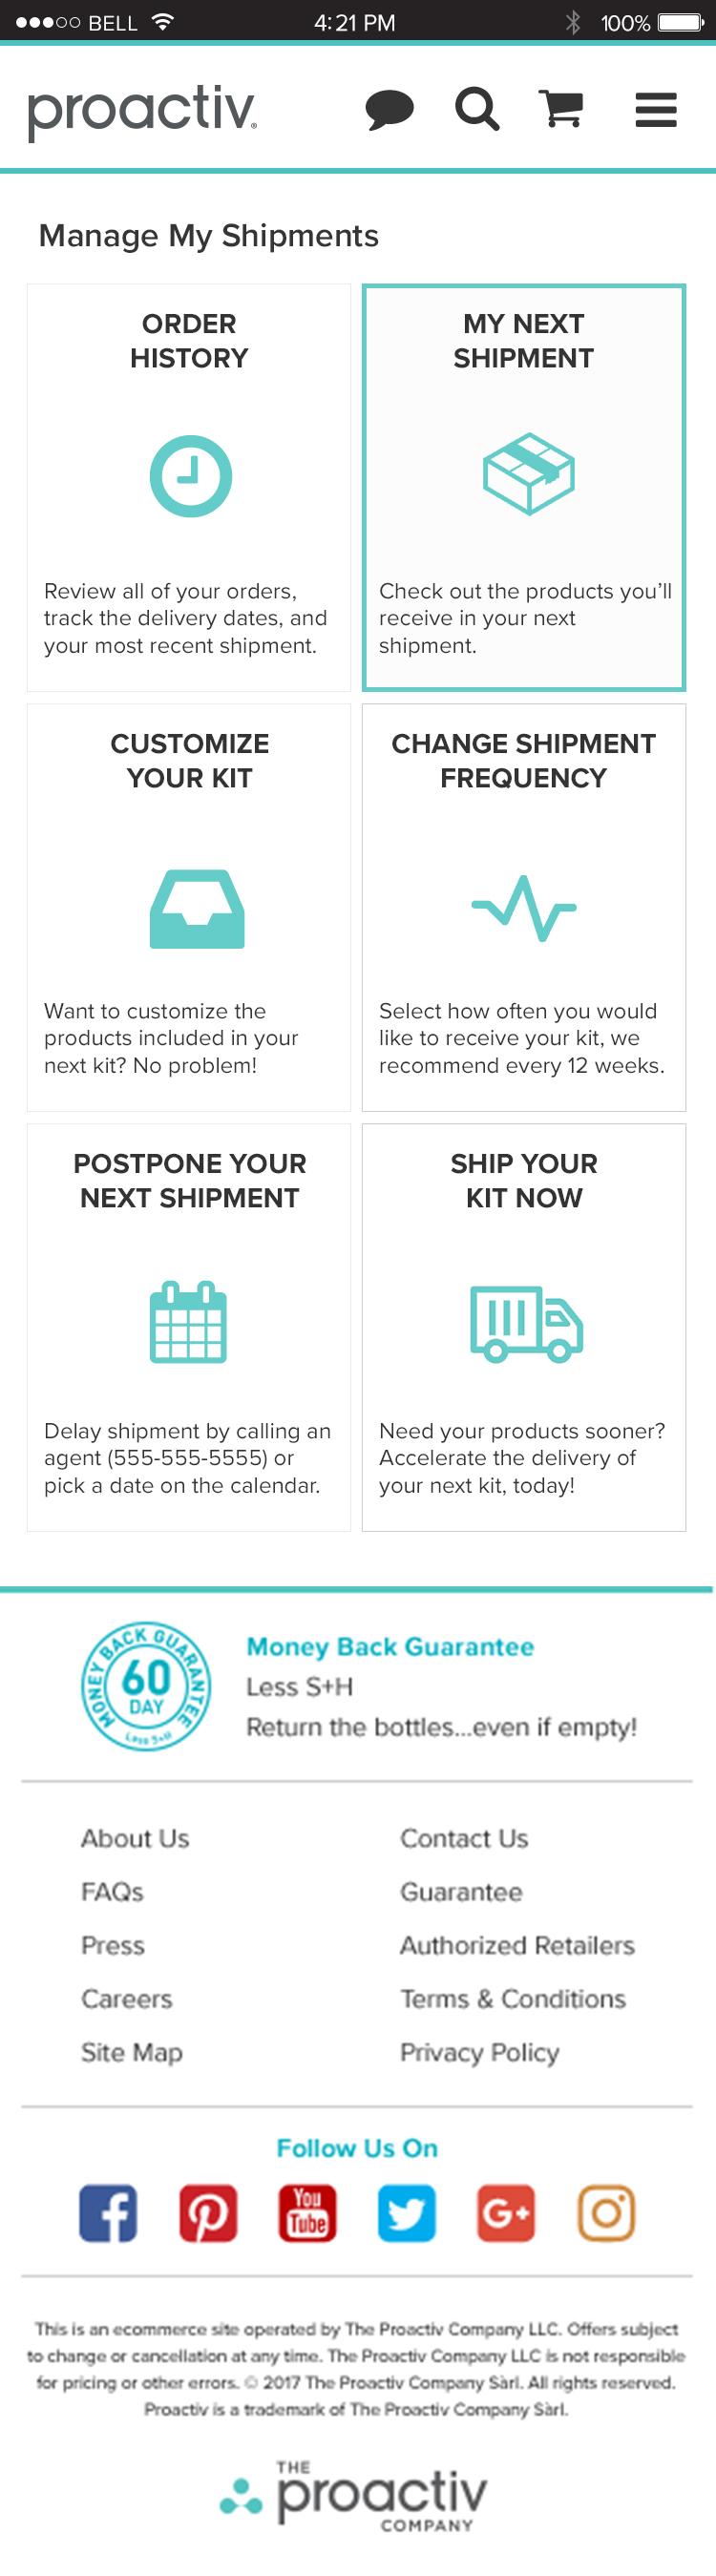 Manage My Shipments